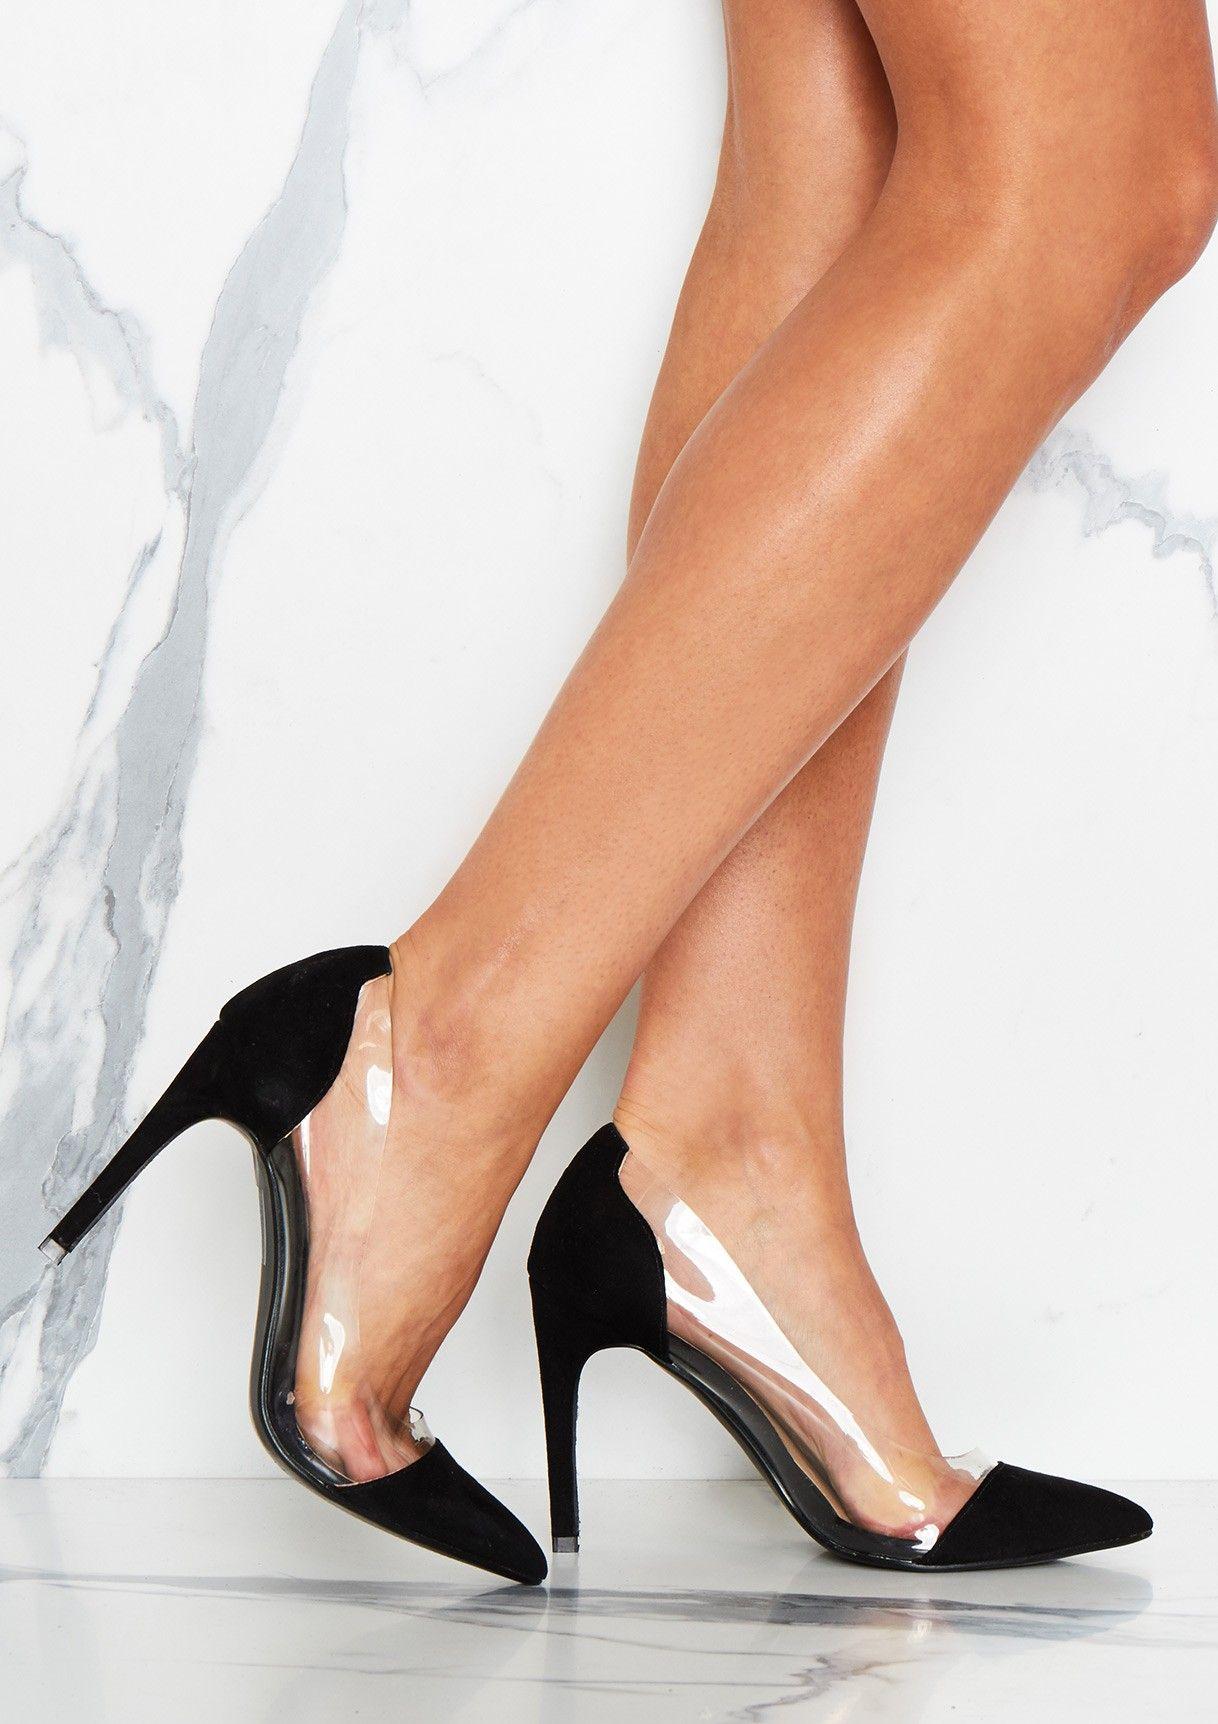 heel women ankle itm toe shoes high sandals open stilettos comforter comfortable strap peep